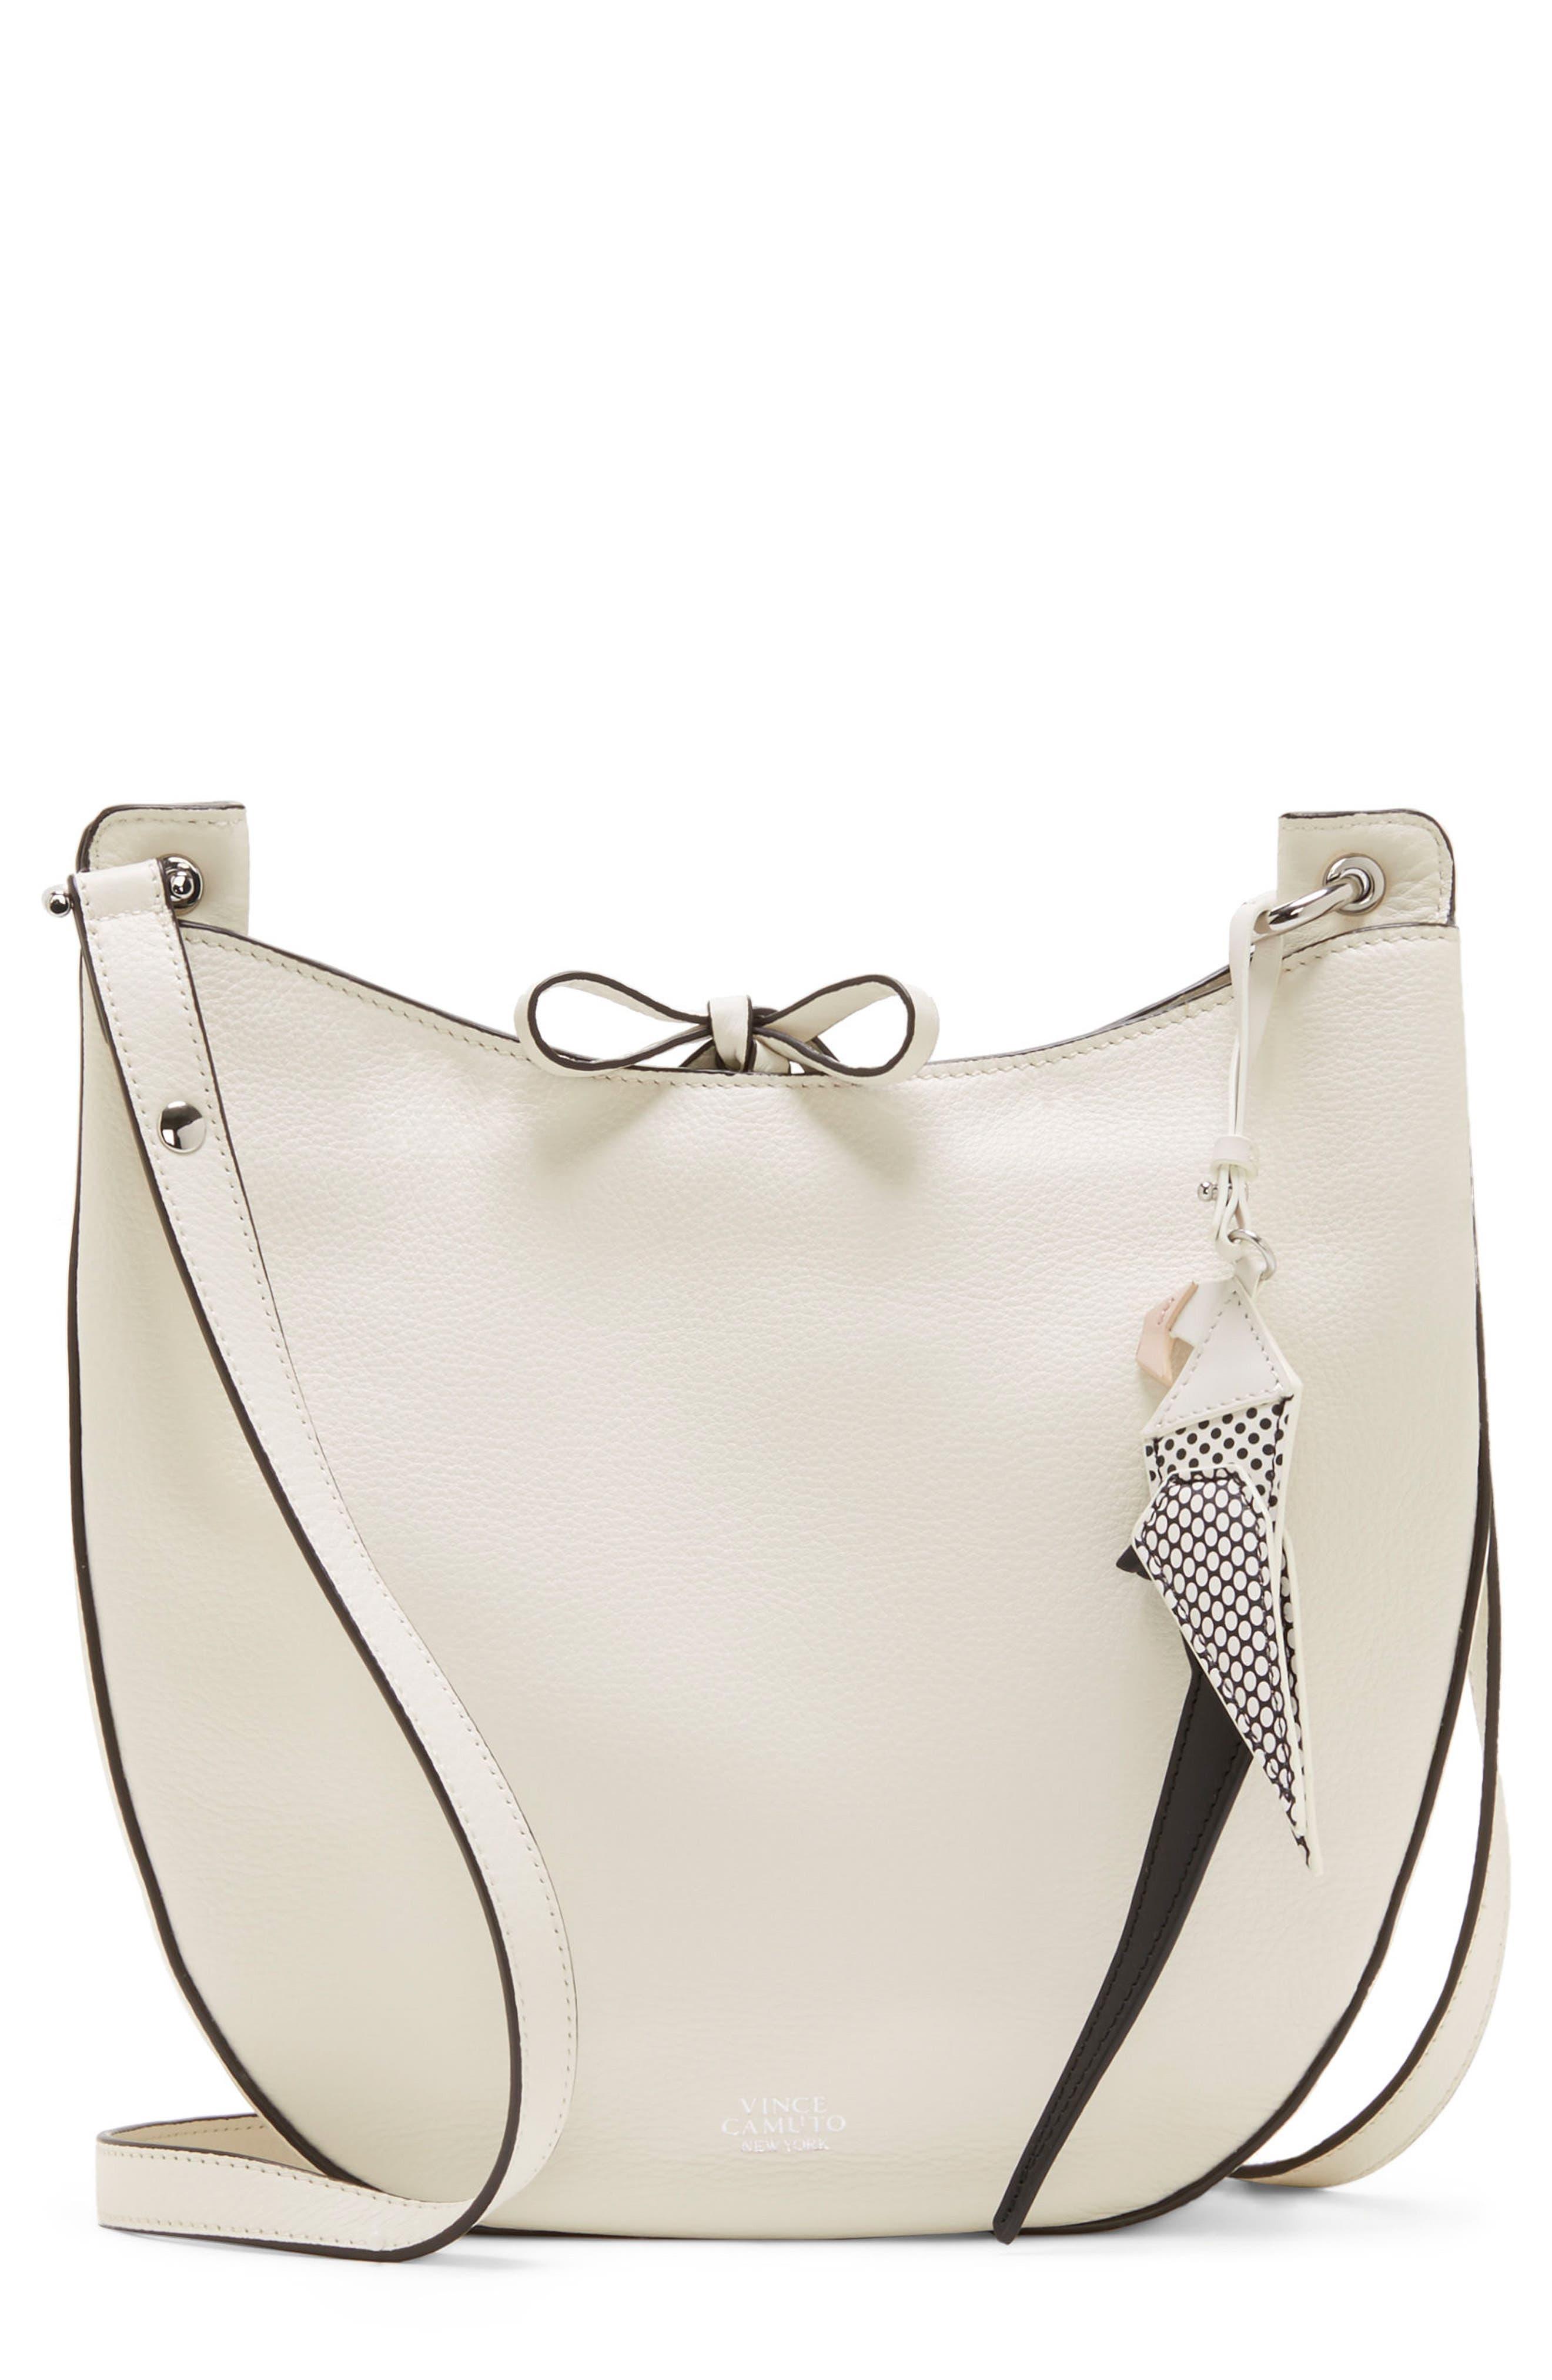 Vince Camuto Polli Leather Crossbody Bag